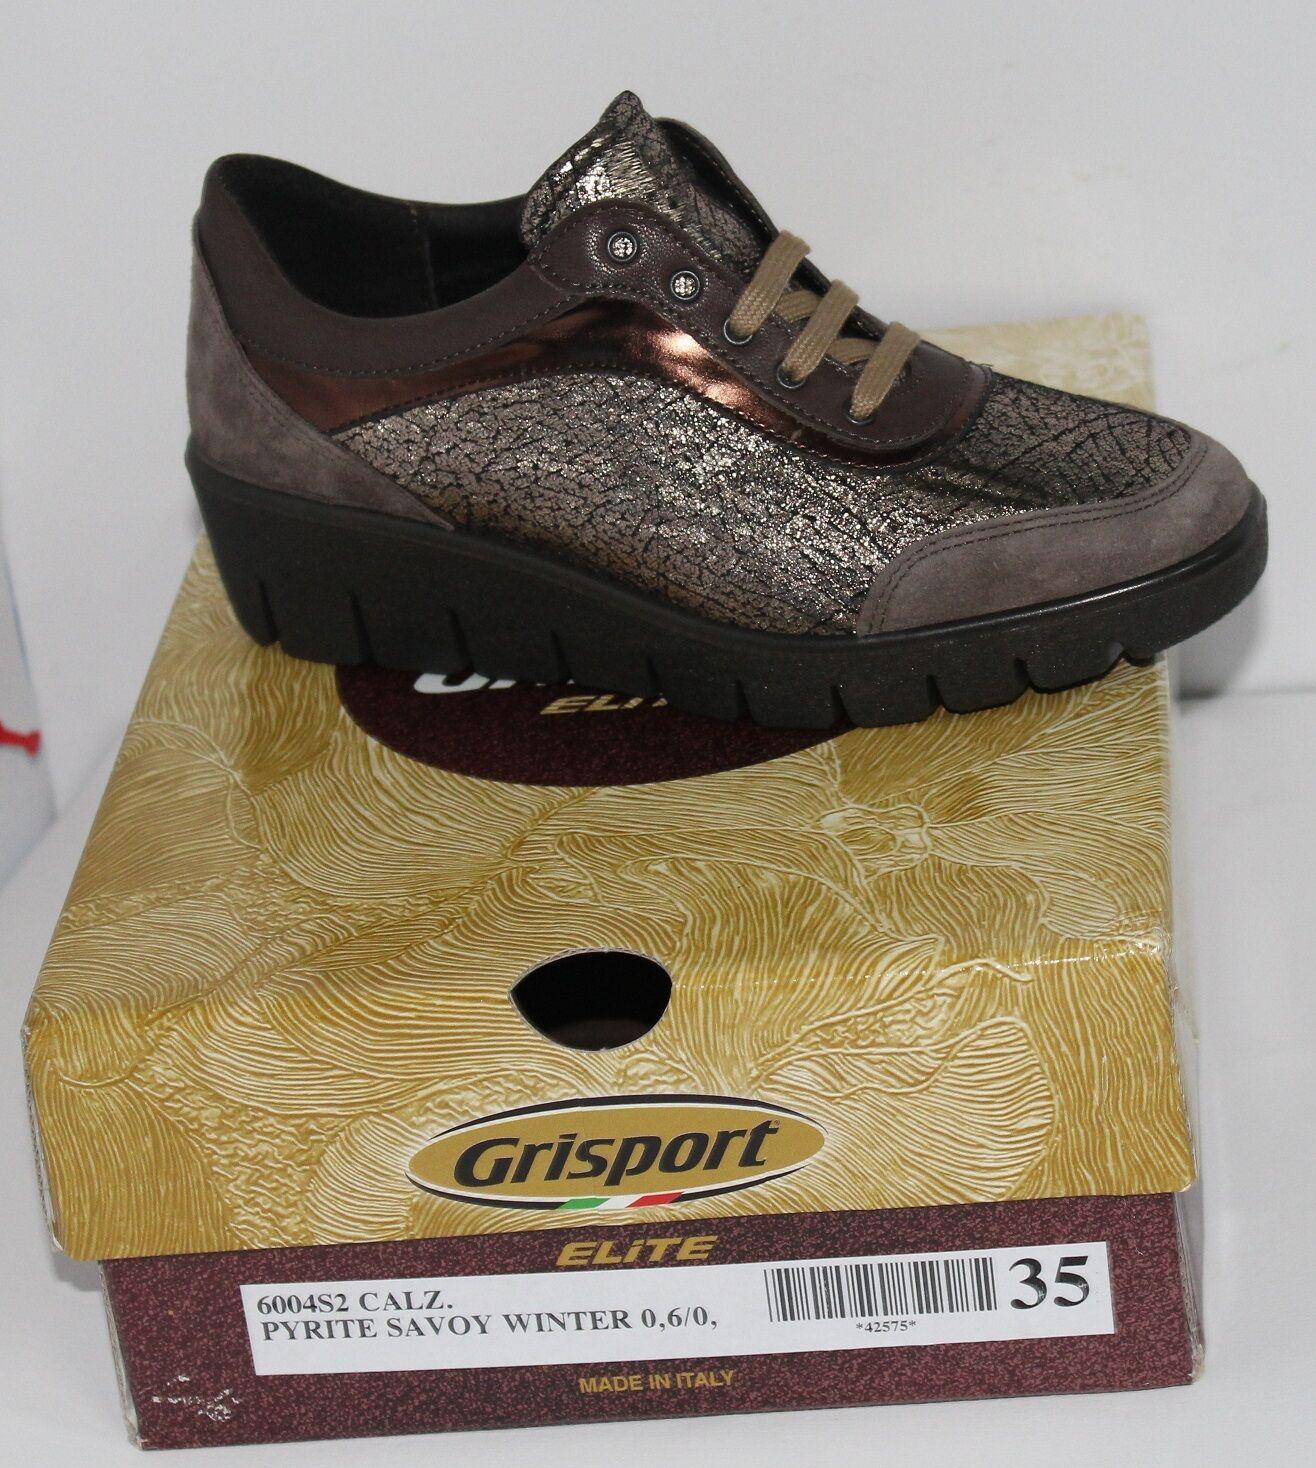 Scarpa da donna gri sport elite   pyrite savoy winter  elite made in italy comodissime 050927